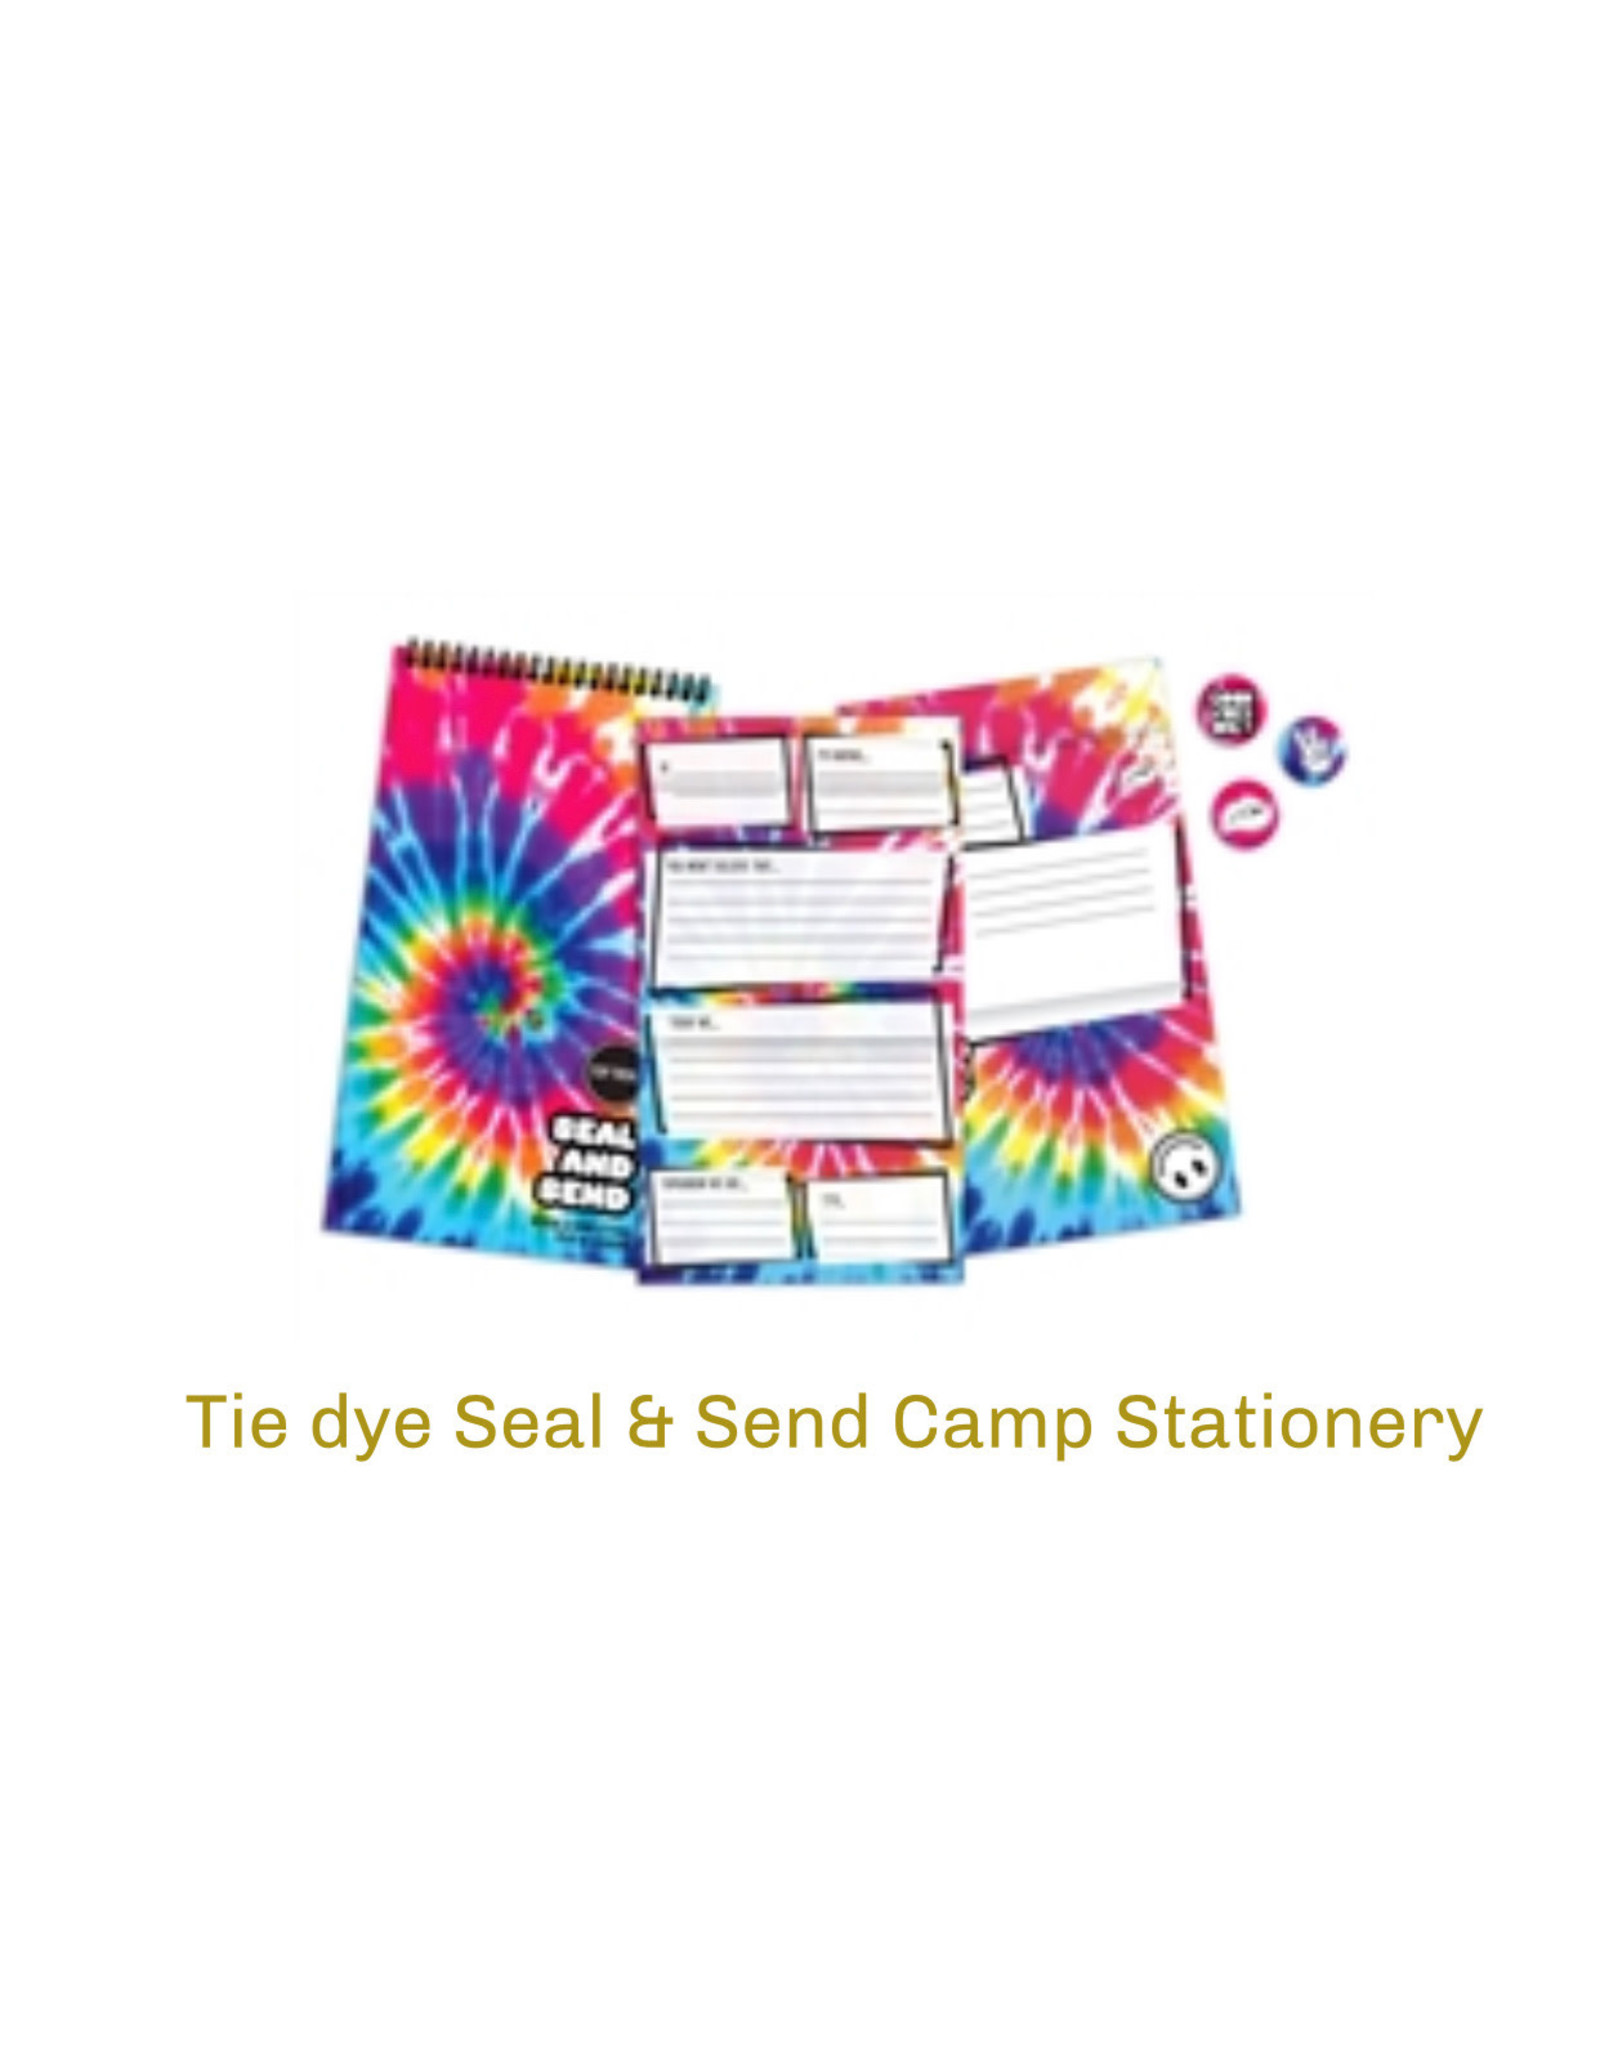 Top Trenz Camp Tie Dye Stationary